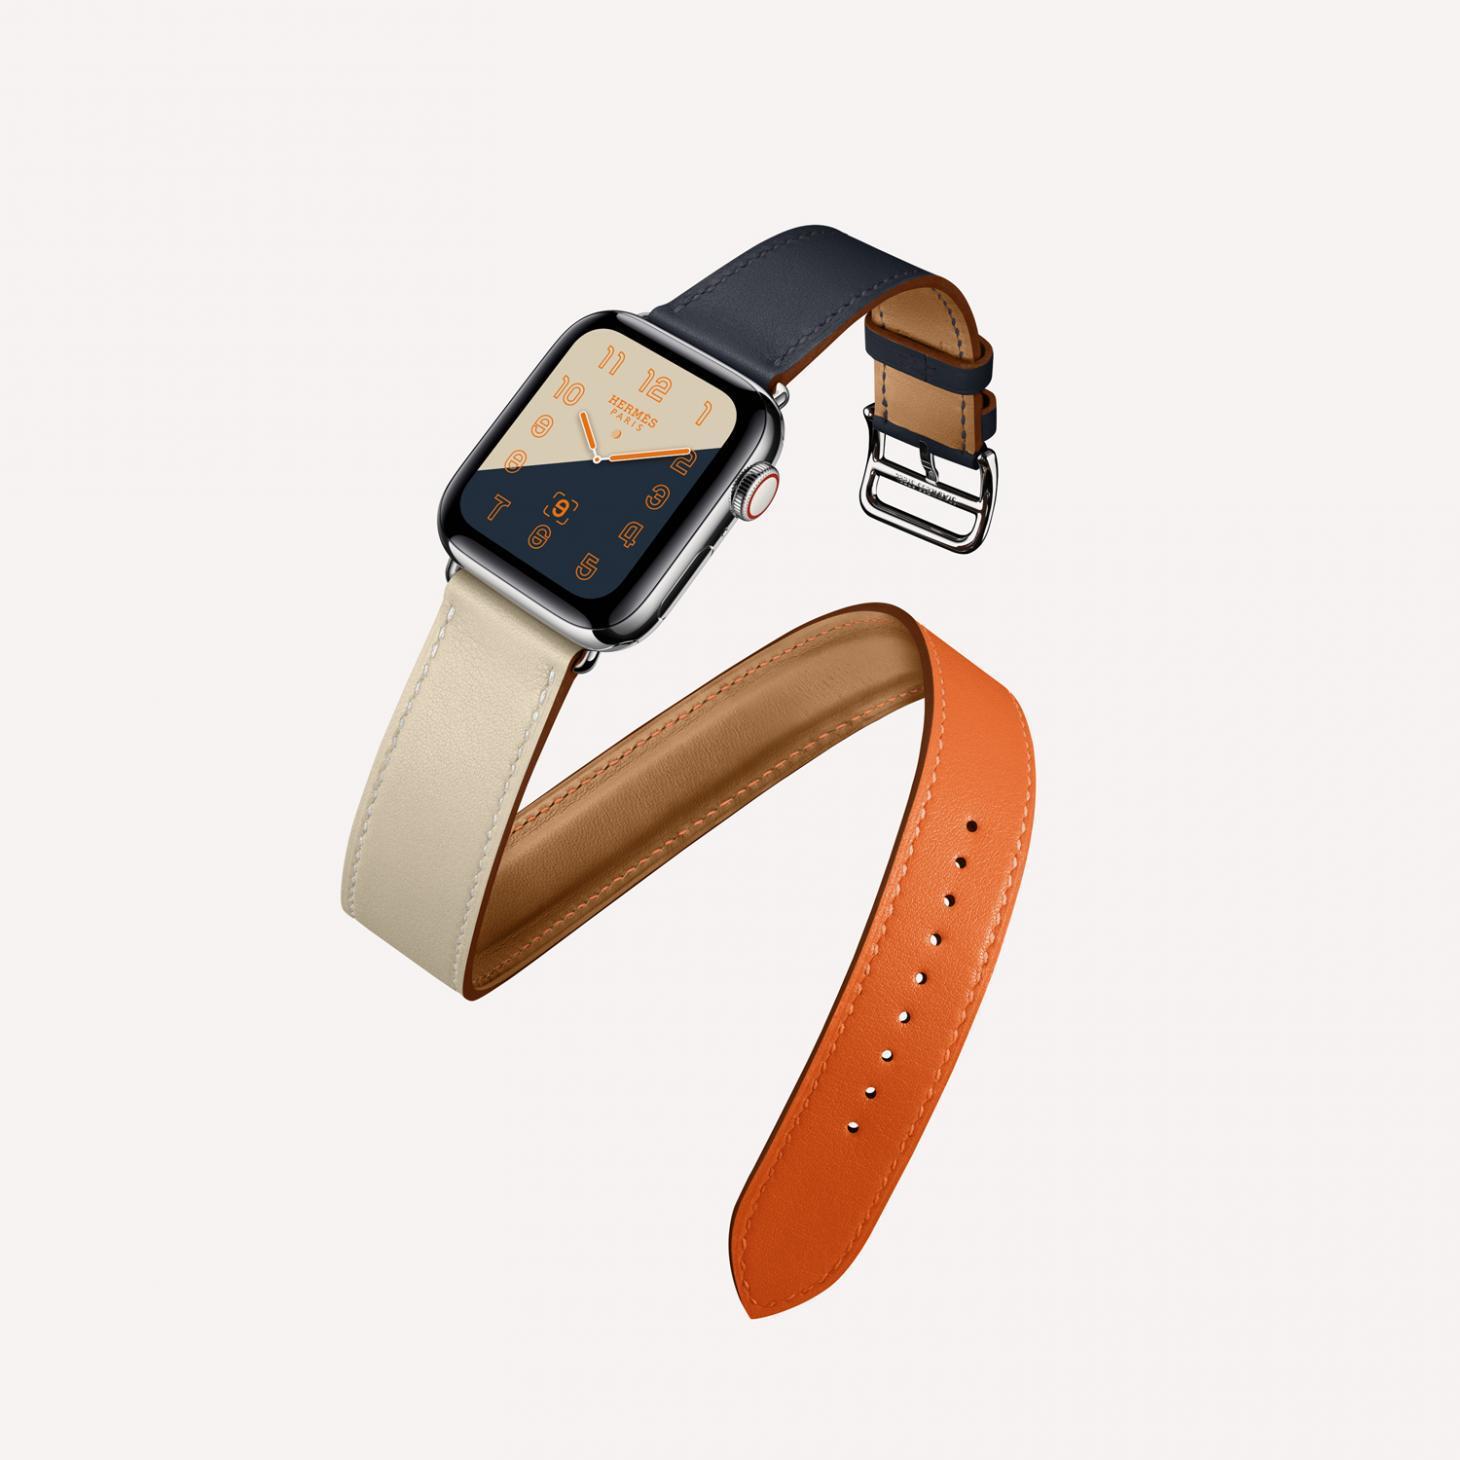 Apple Watch Series 4 wallpapers